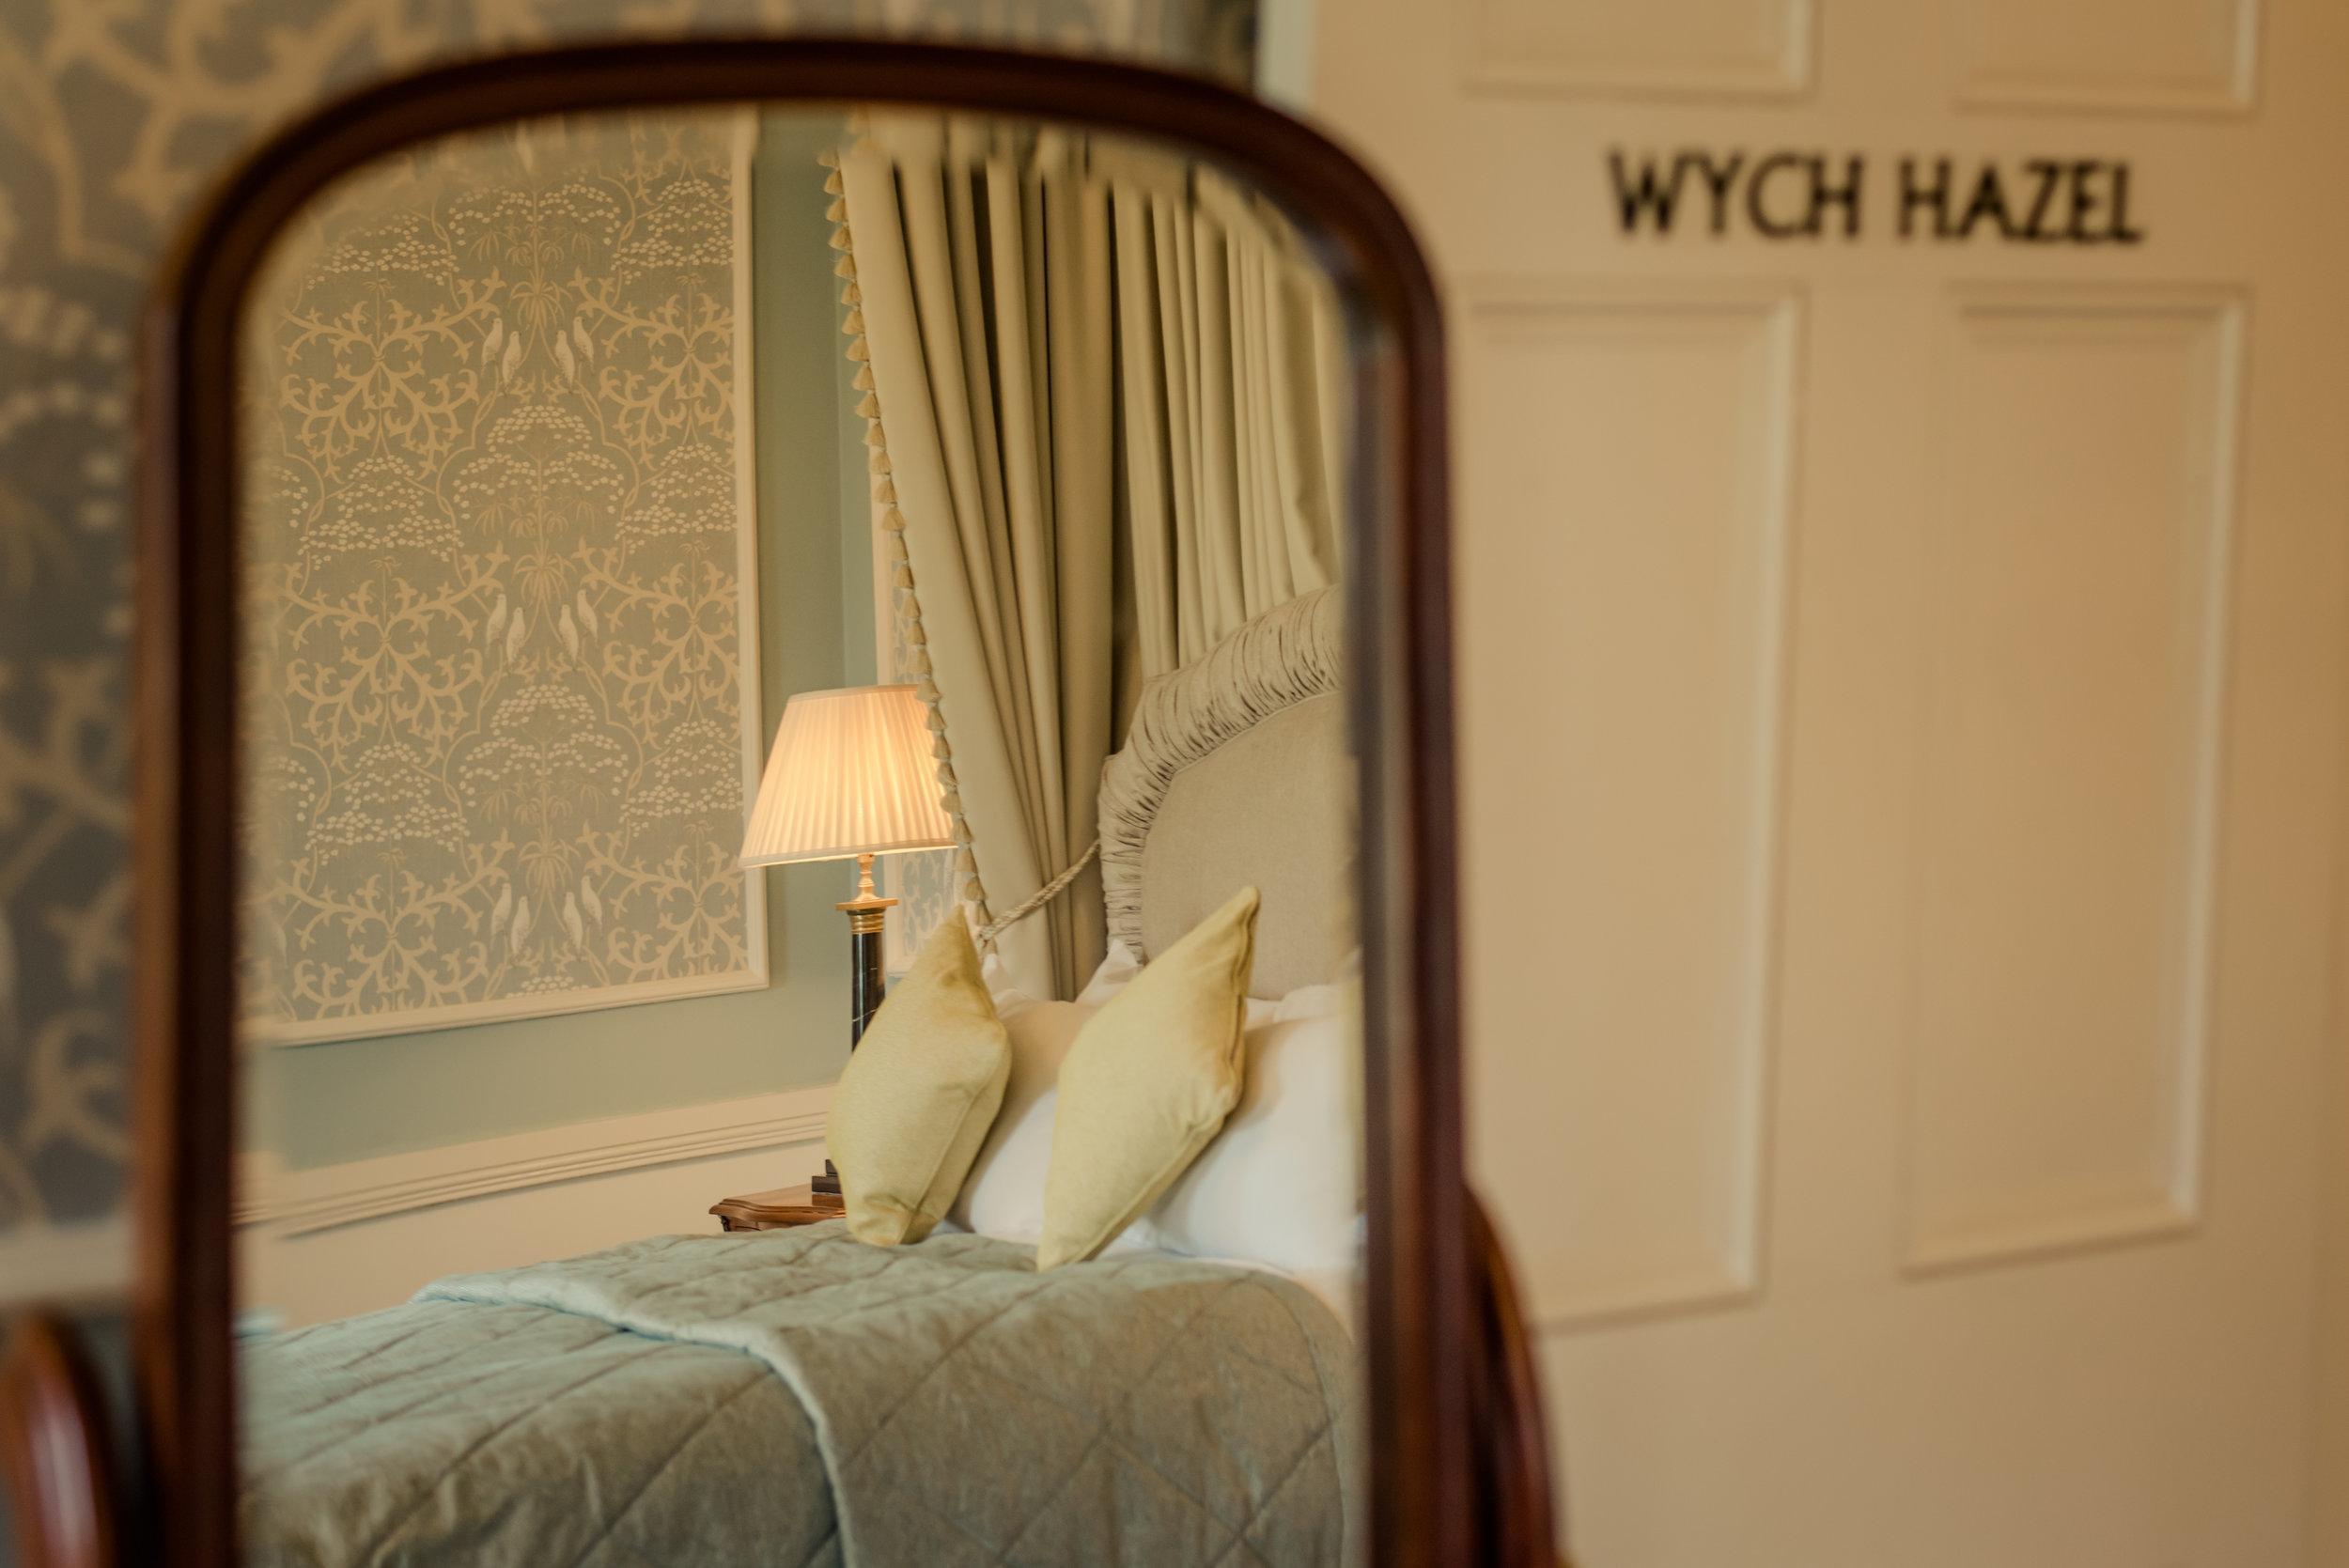 Tulfarris Hotel & Golf Resort Wych Hazel door with mirror room reflection.jpg